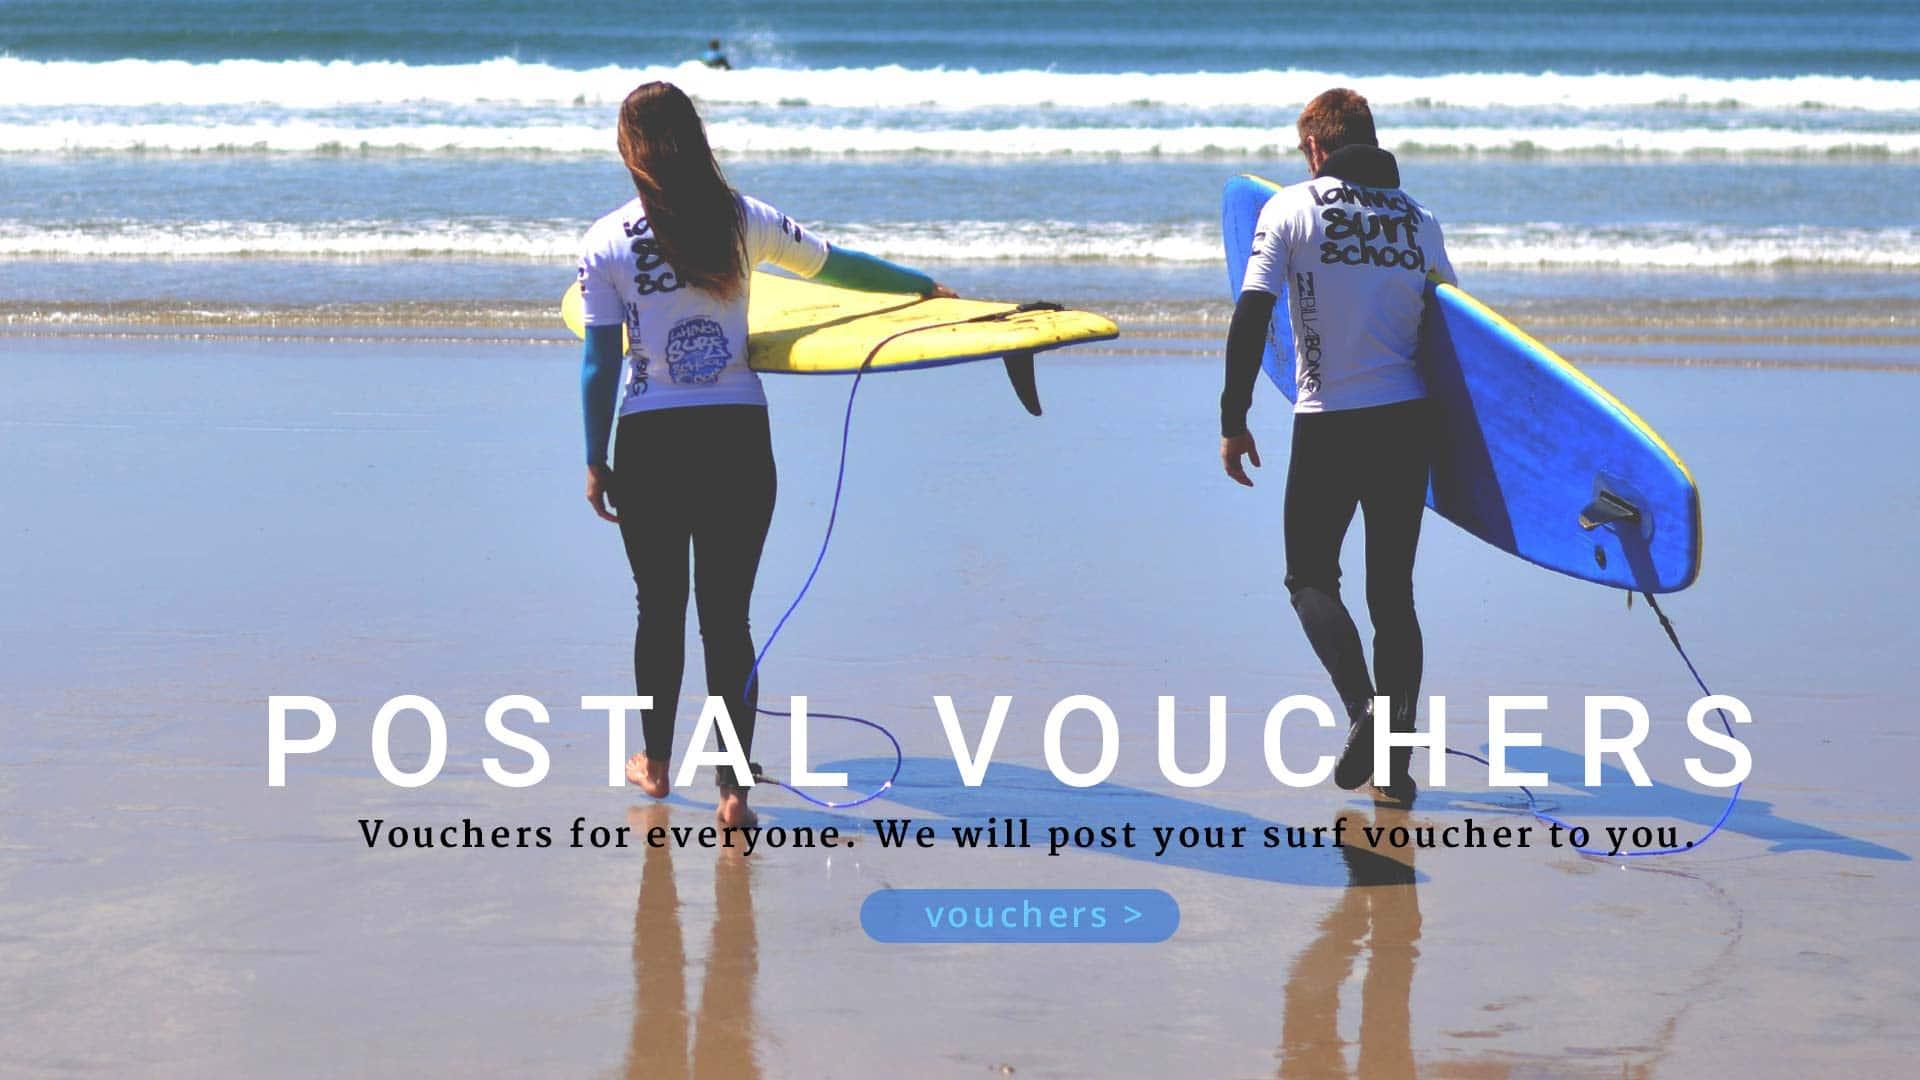 postal-vouchers-image-promo